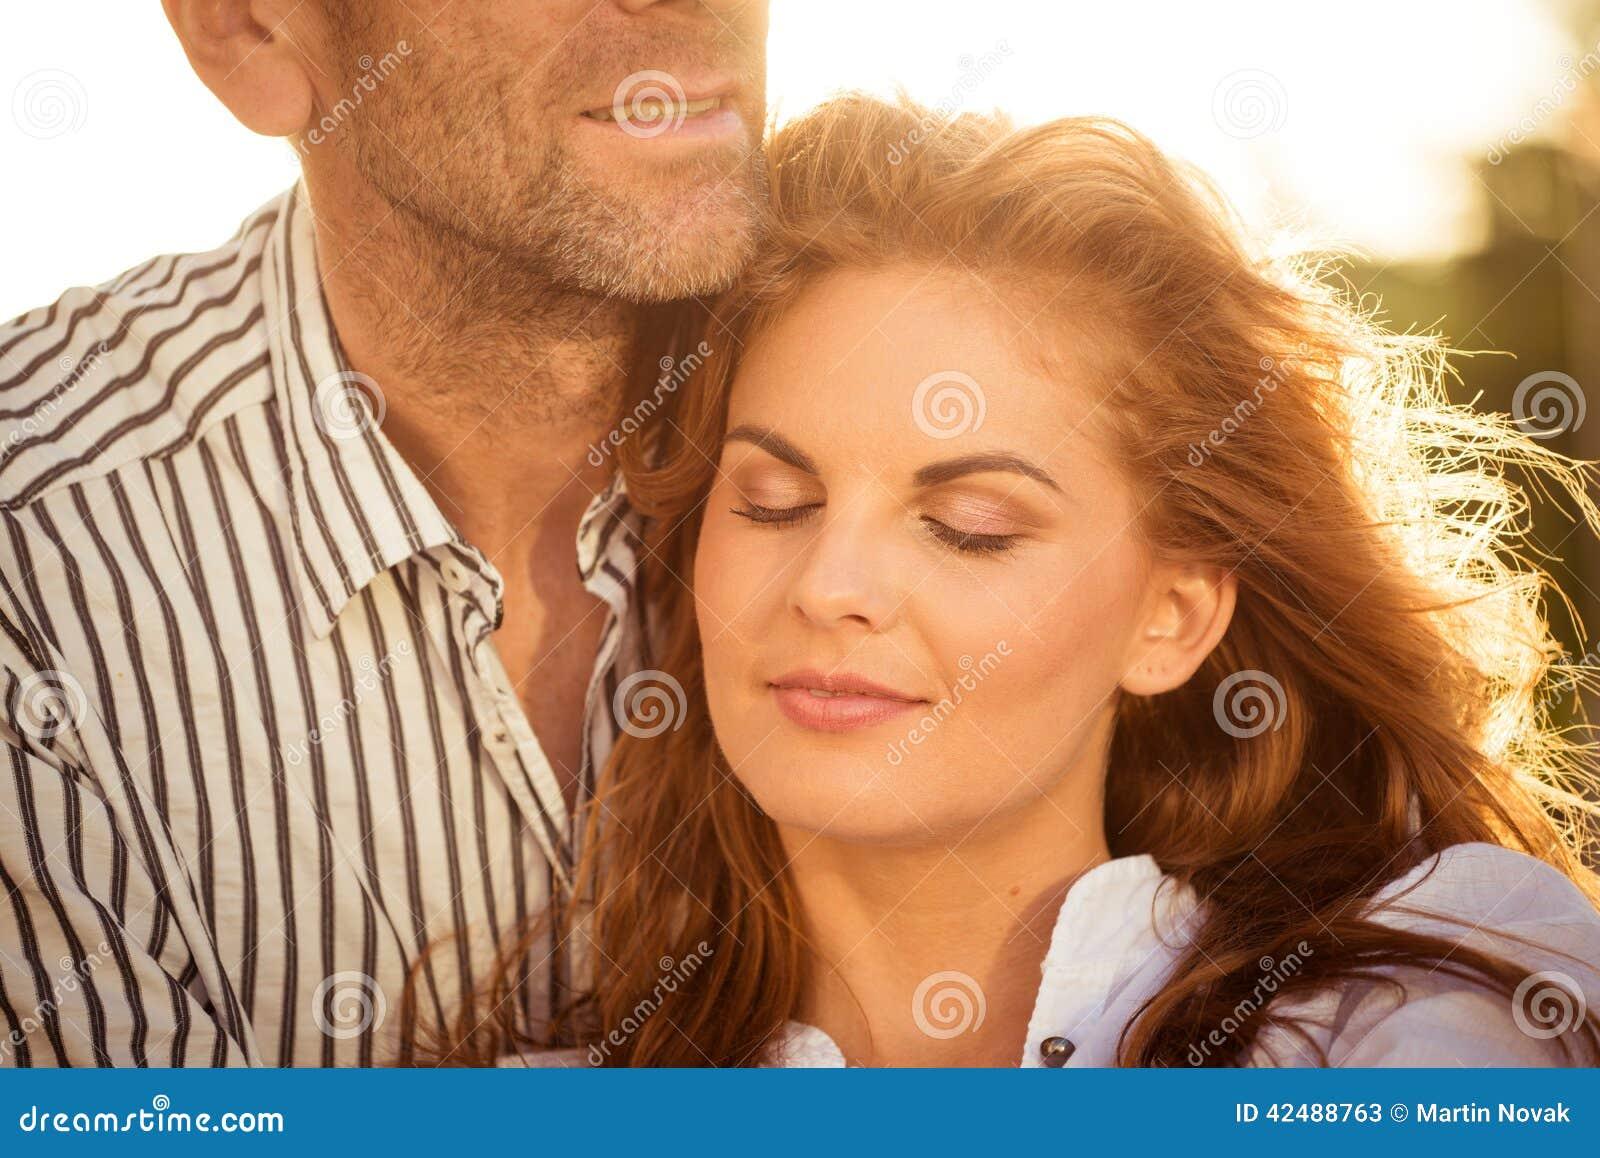 foto-televedushih-intimnie-momenti-na-foto-tolstiy-hrich